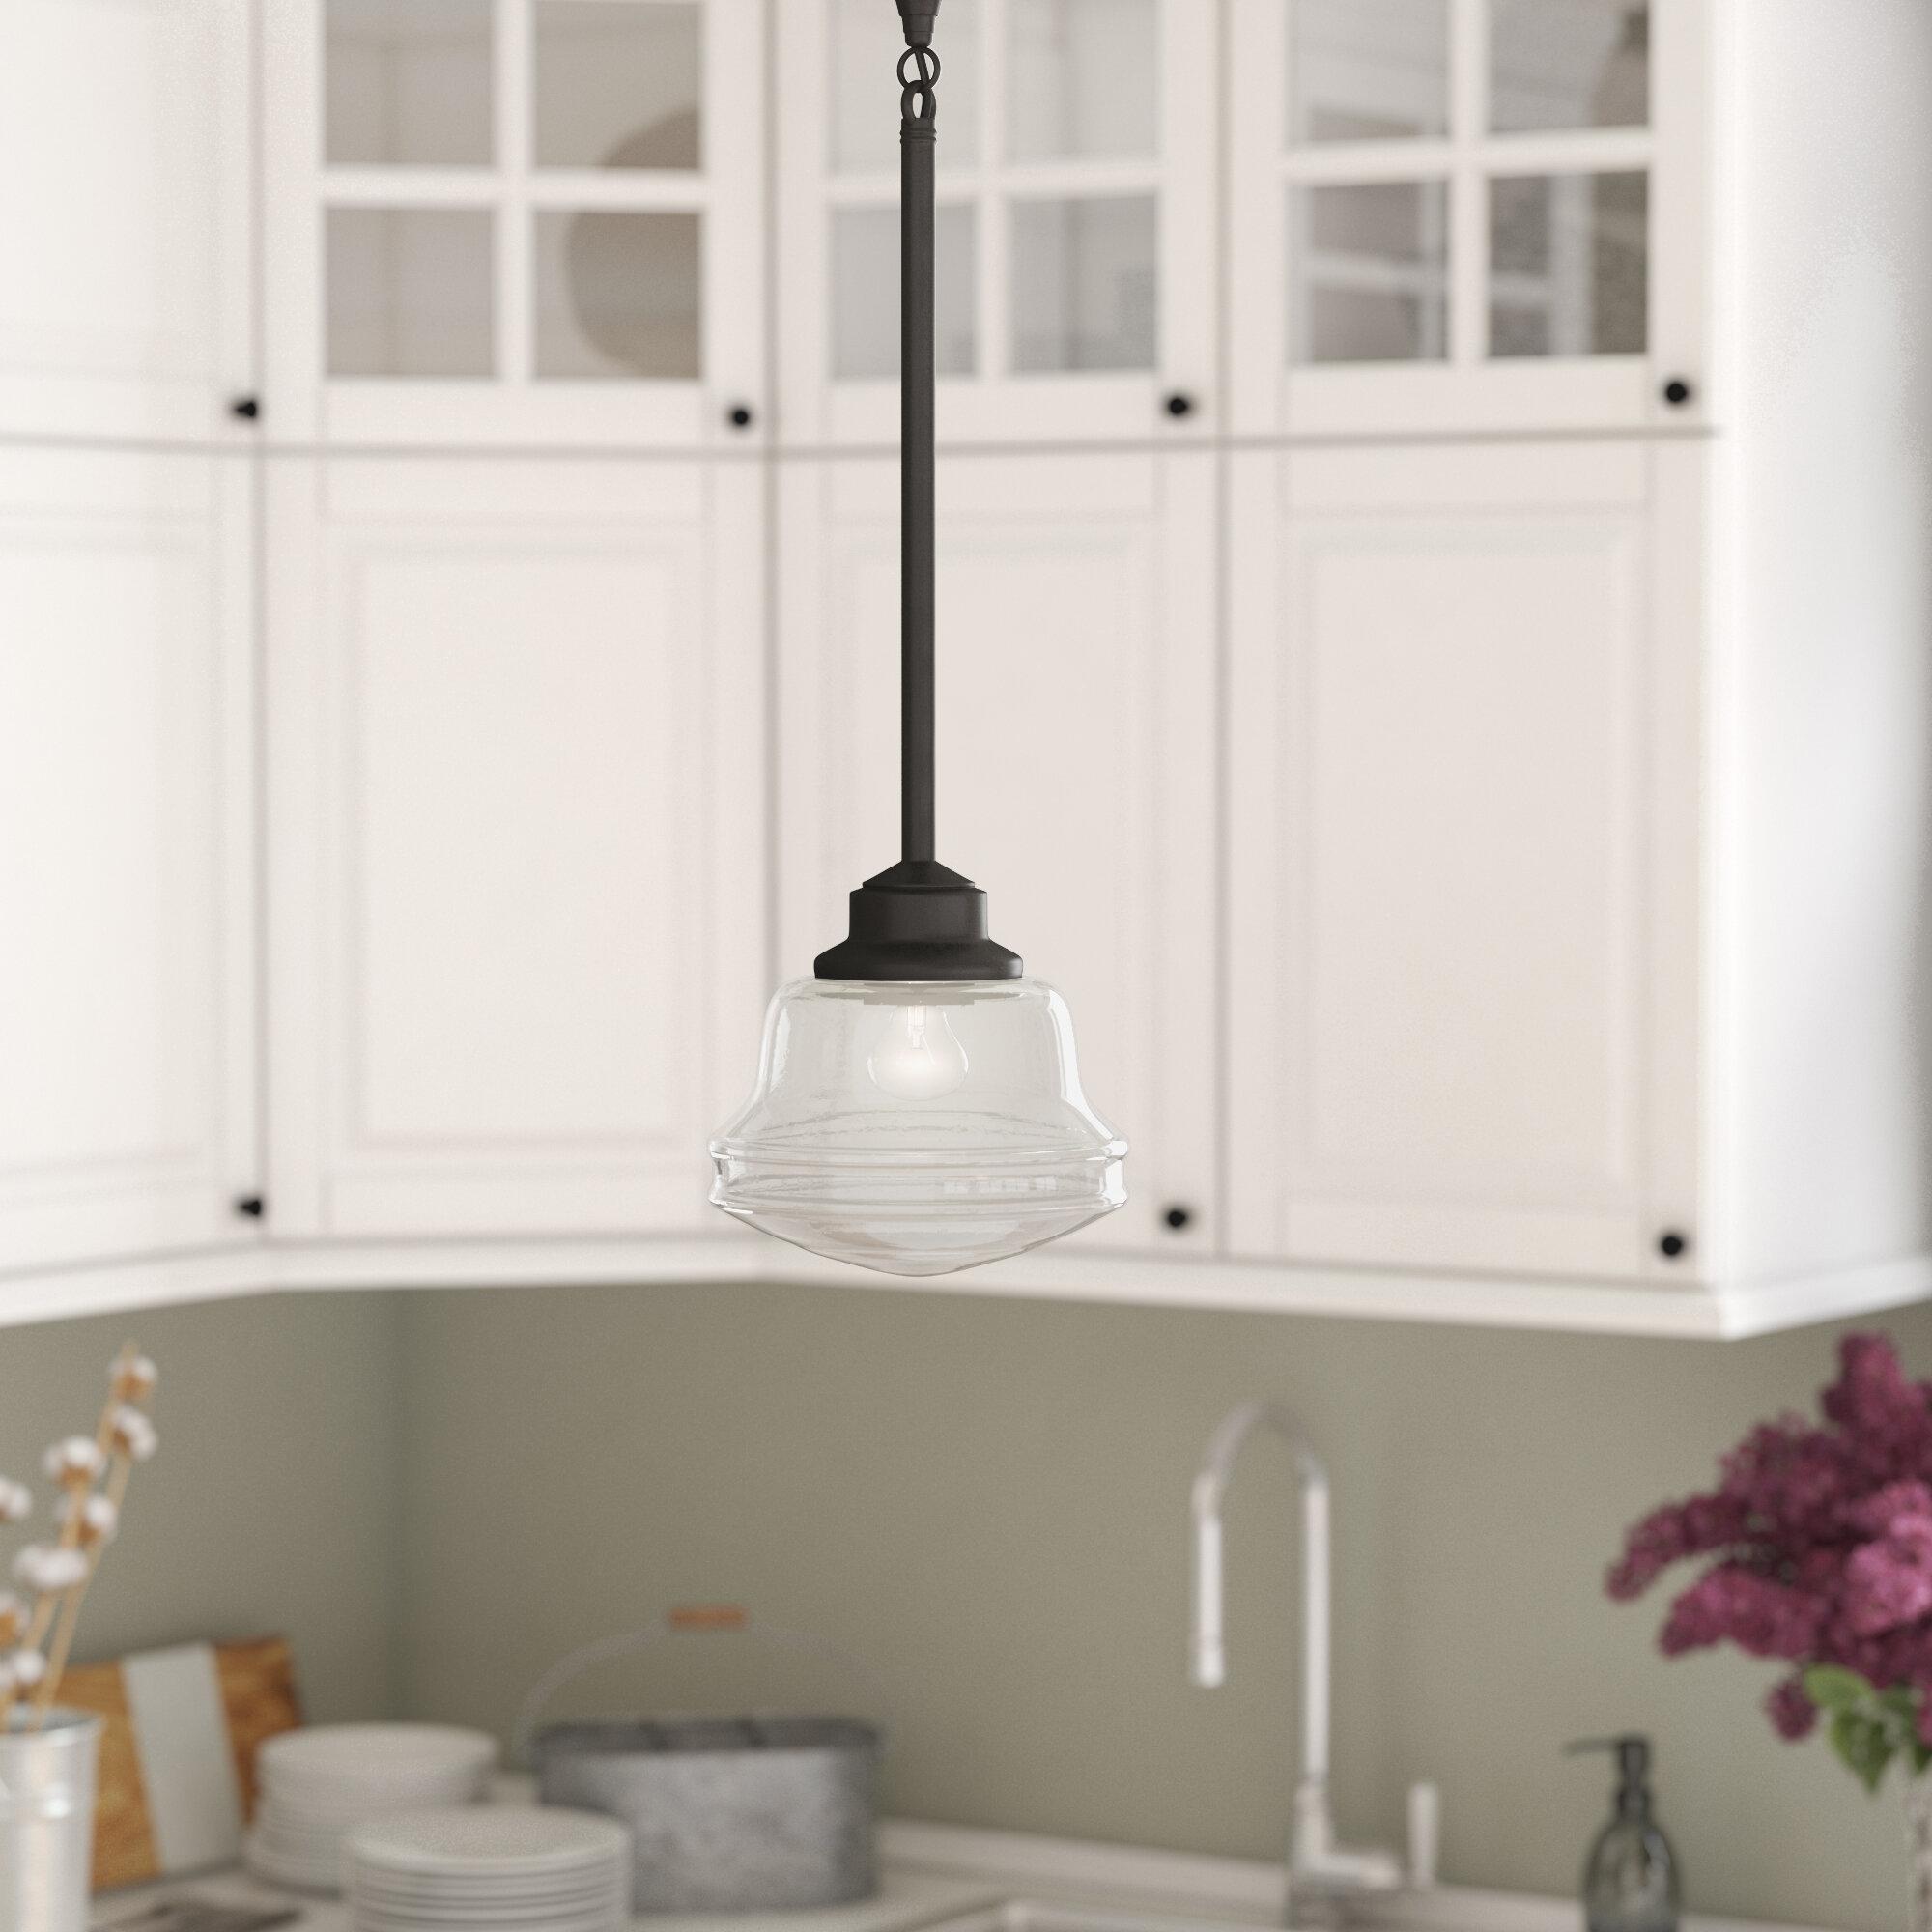 Beau Laurel Foundry Modern Farmhouse Margaree 1 Light Schoolhouse Pendant U0026  Reviews | Wayfair